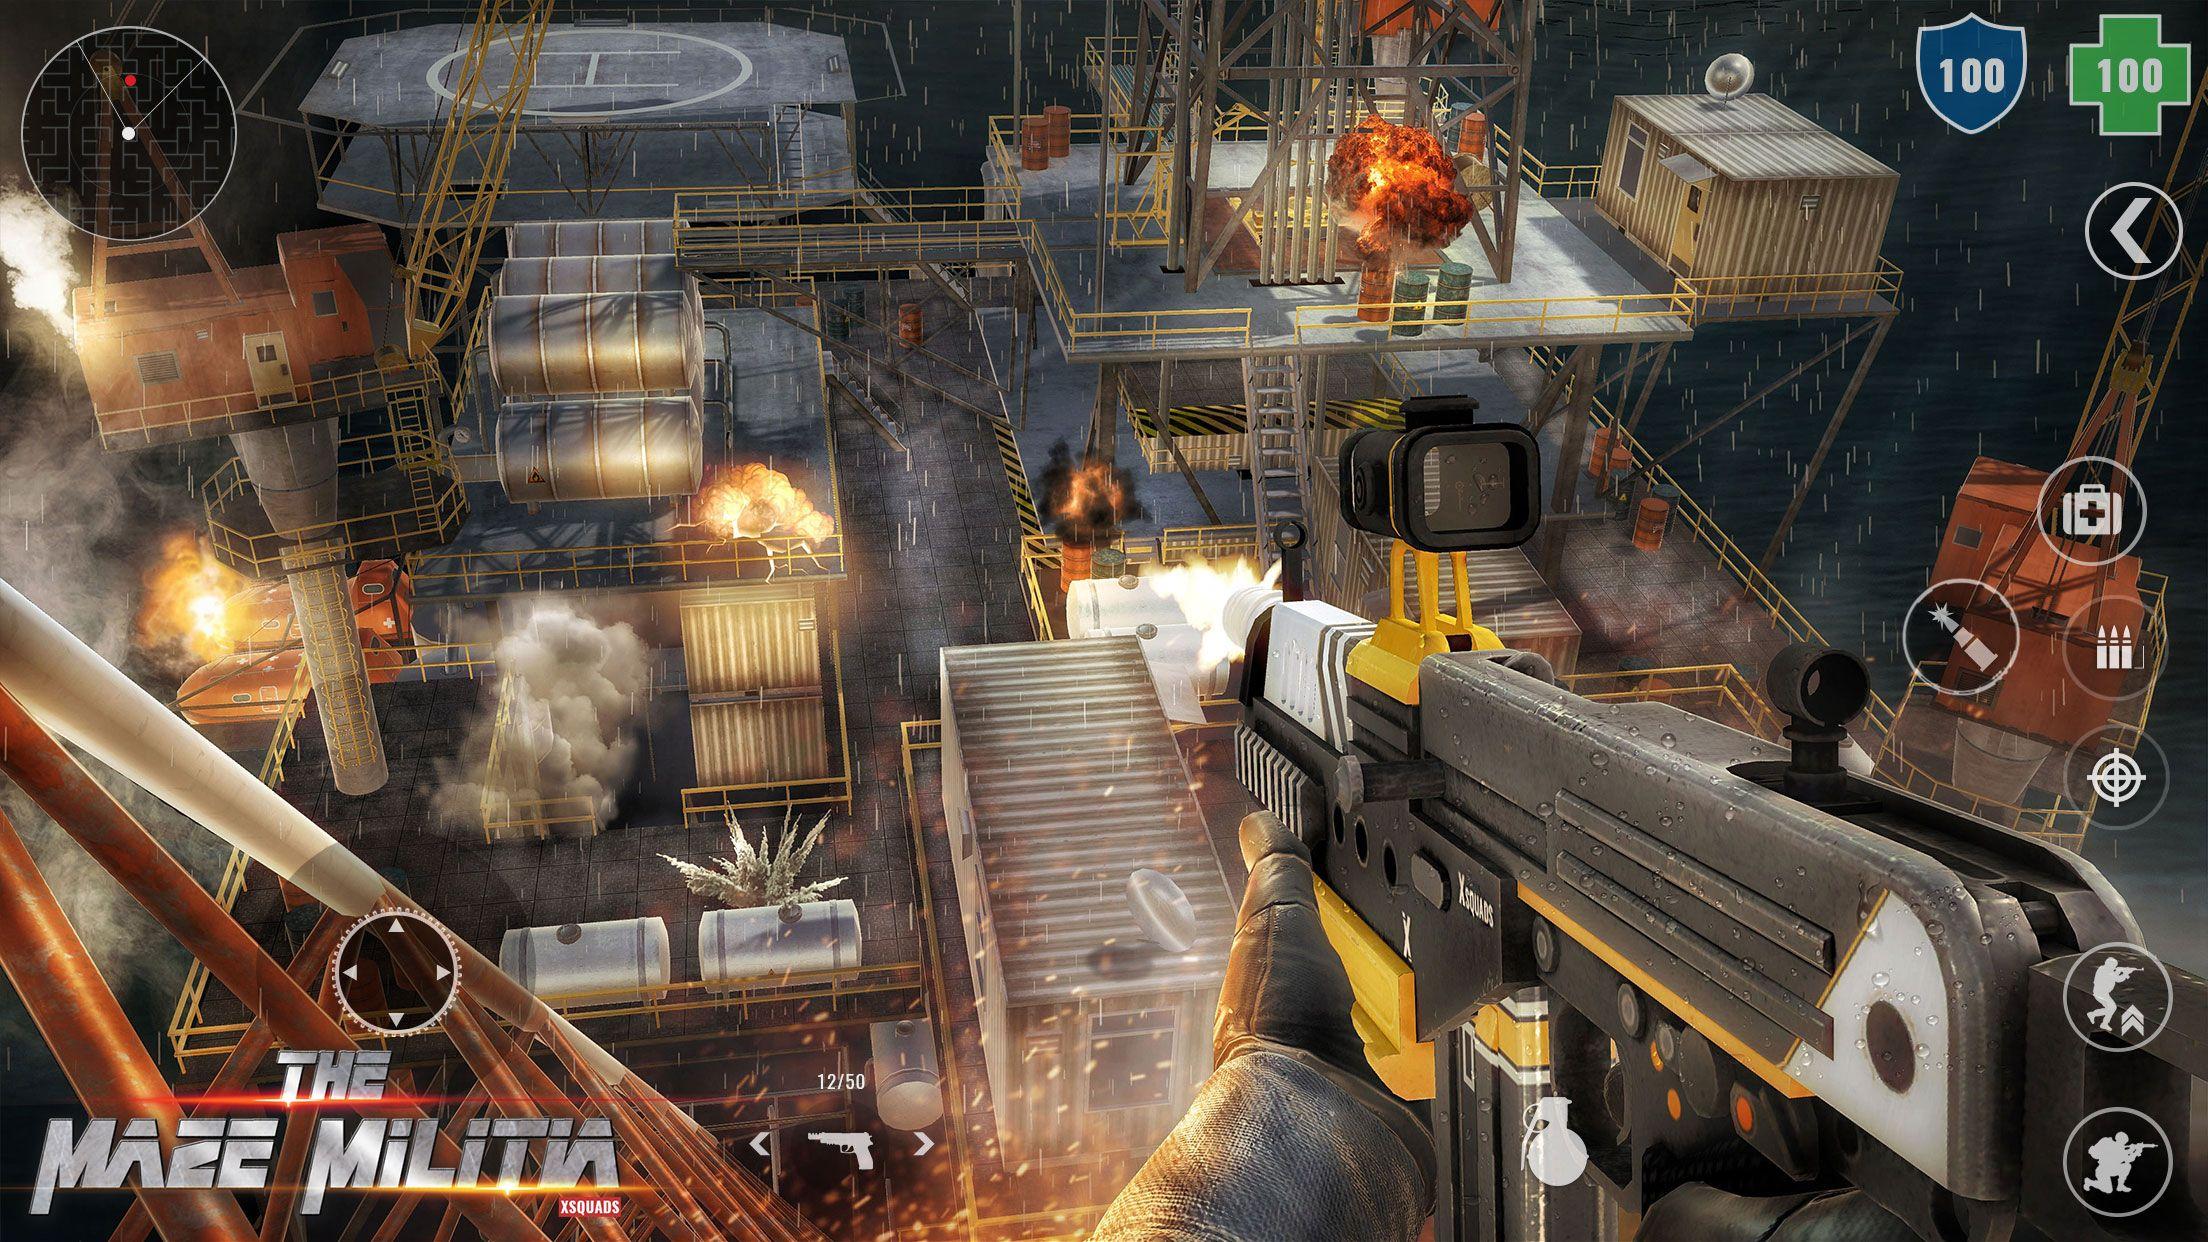 skytespill Top video games, Games, Shooting games